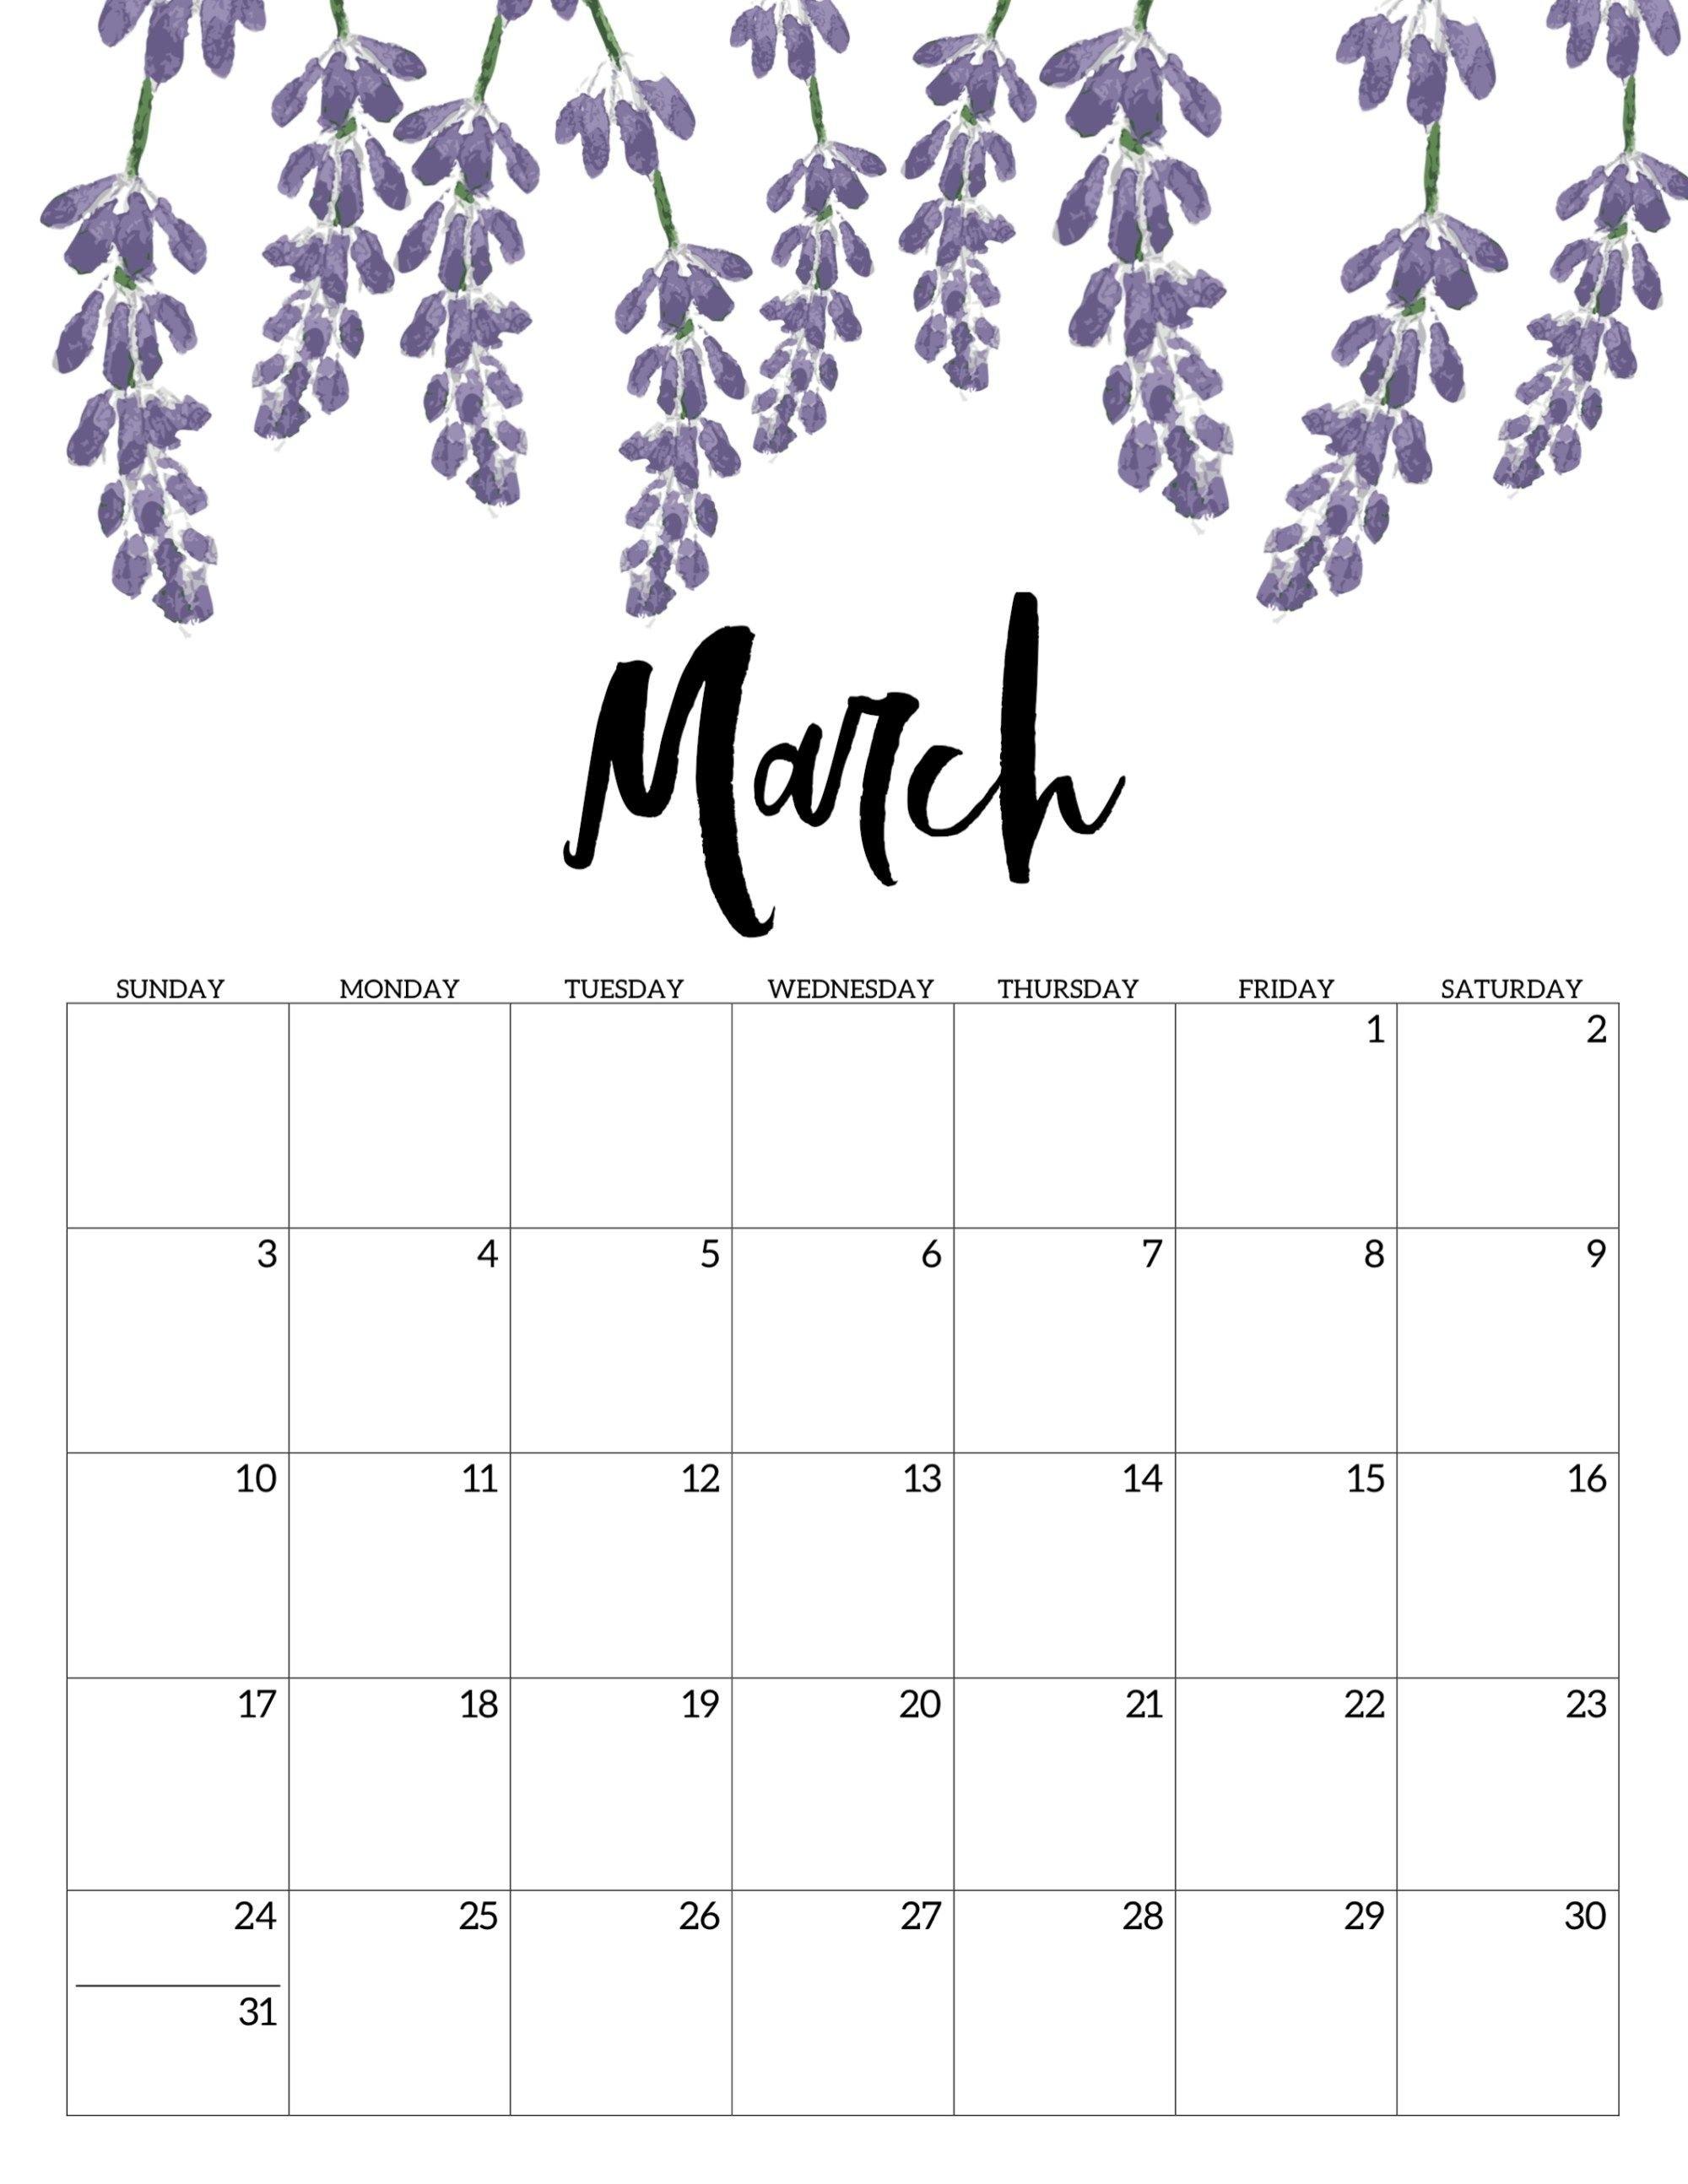 Free Printable Calendar 2019 - Floral | Calendar | Calendar, Free Print A Calendar 2019 Free